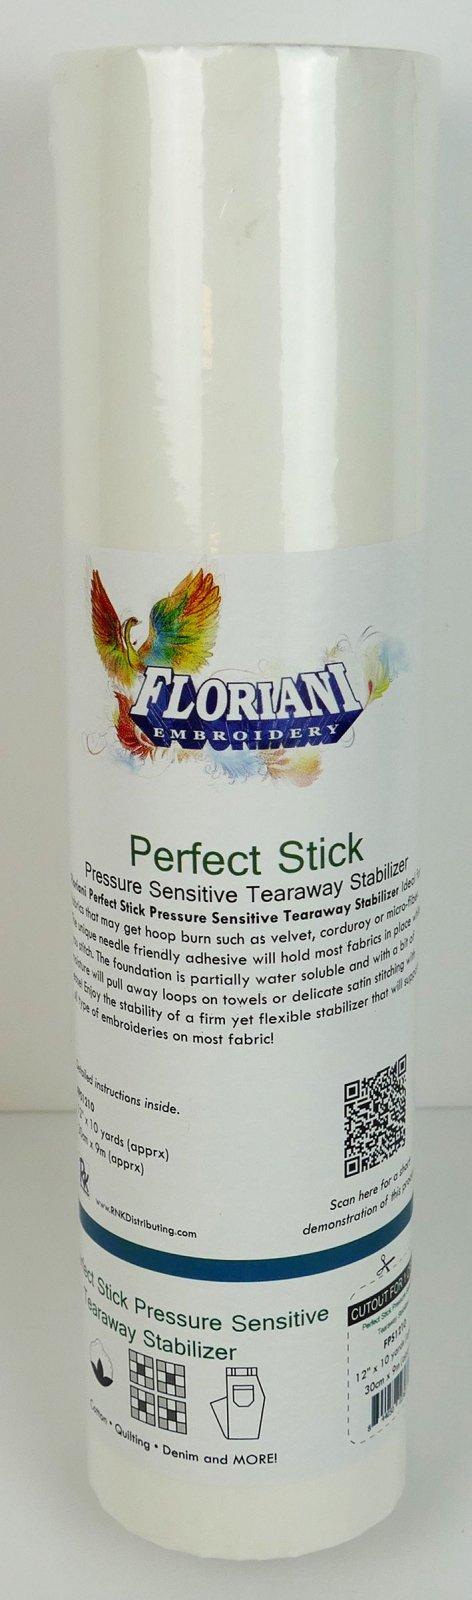 Perfect Stick : Pressure Sensitive Tearaway Stabilizer - 12 x 10 yards - Floriani